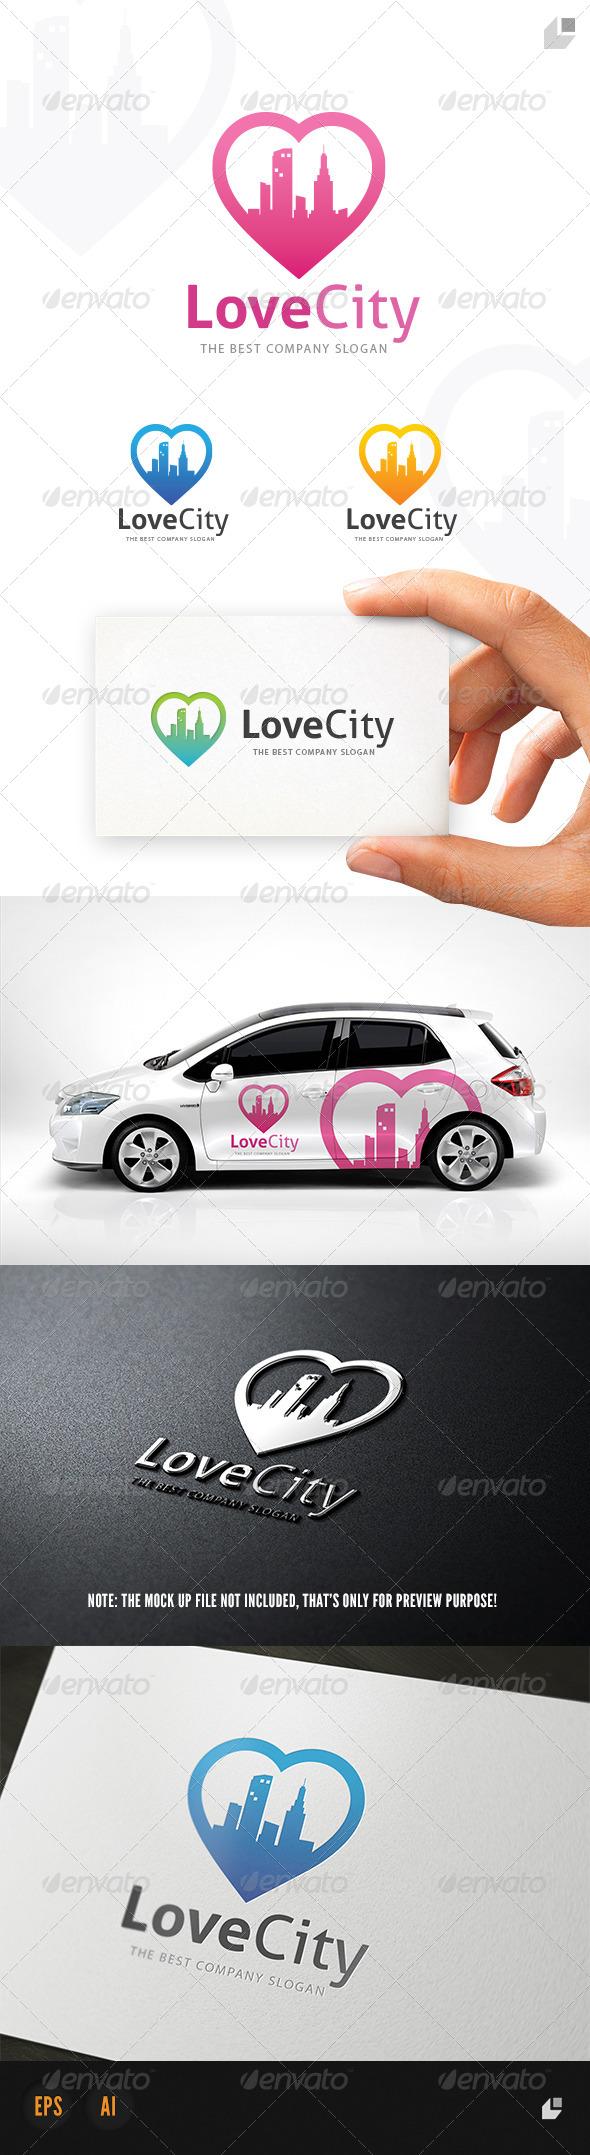 GraphicRiver Love City Logo 5311462